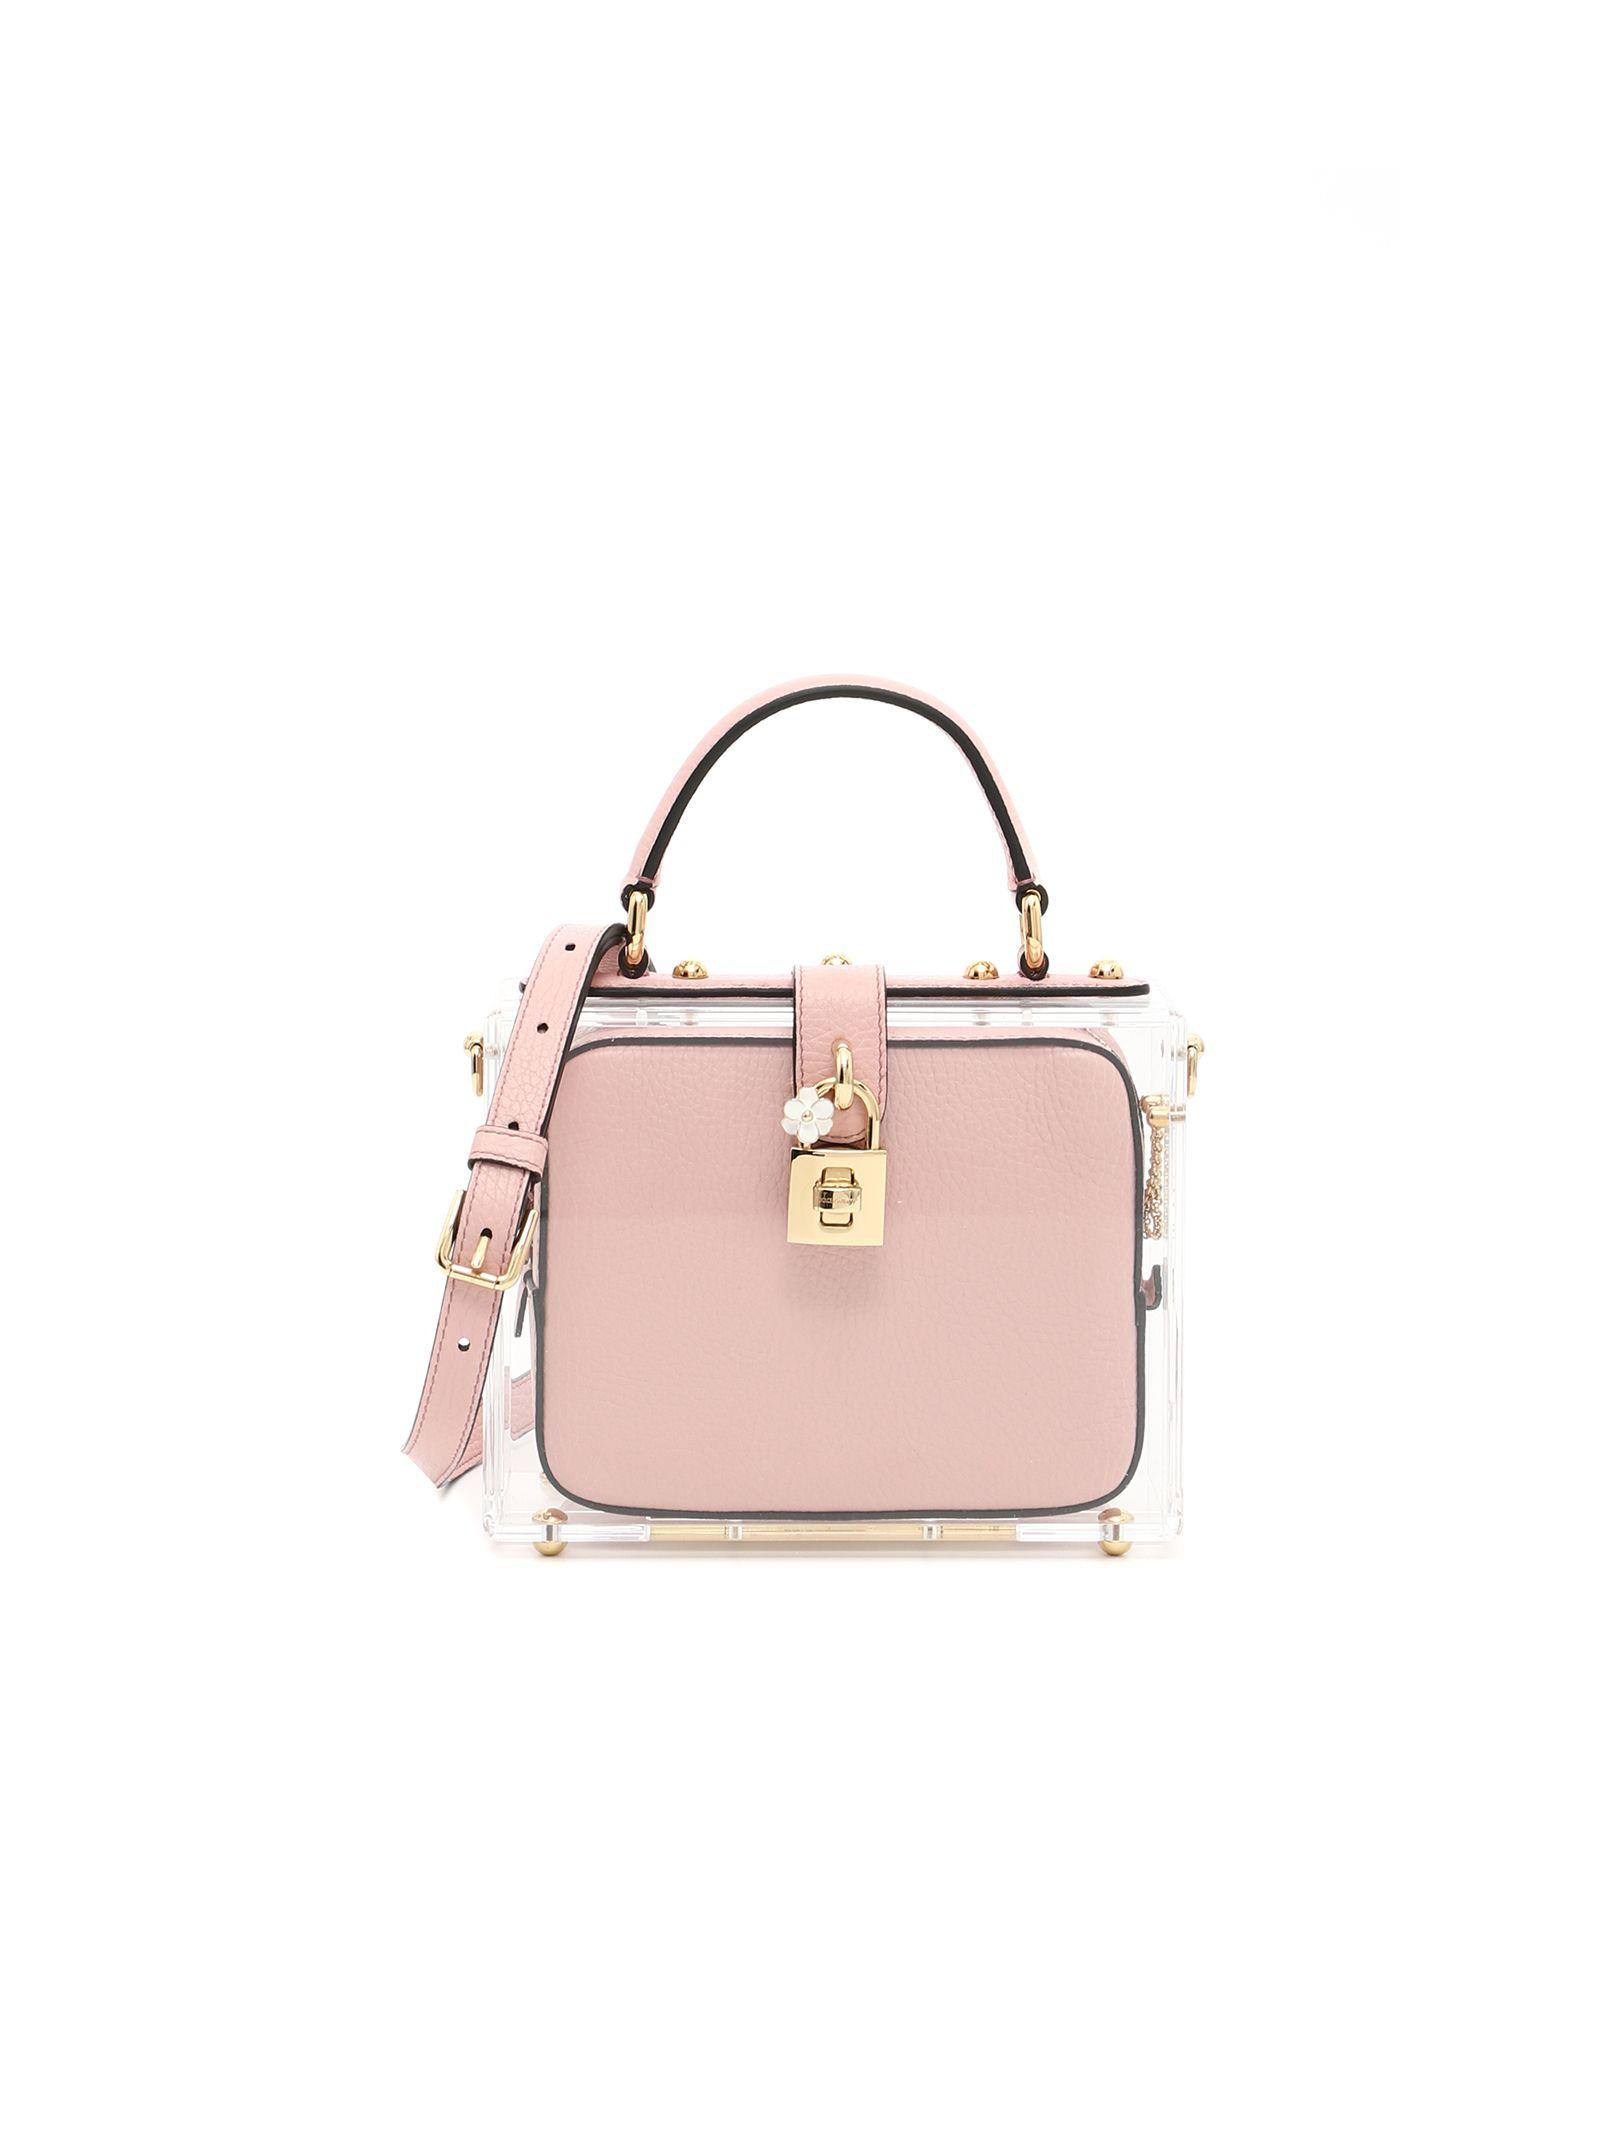 Geantă de damă DOLCE & GABBANA Box Bag